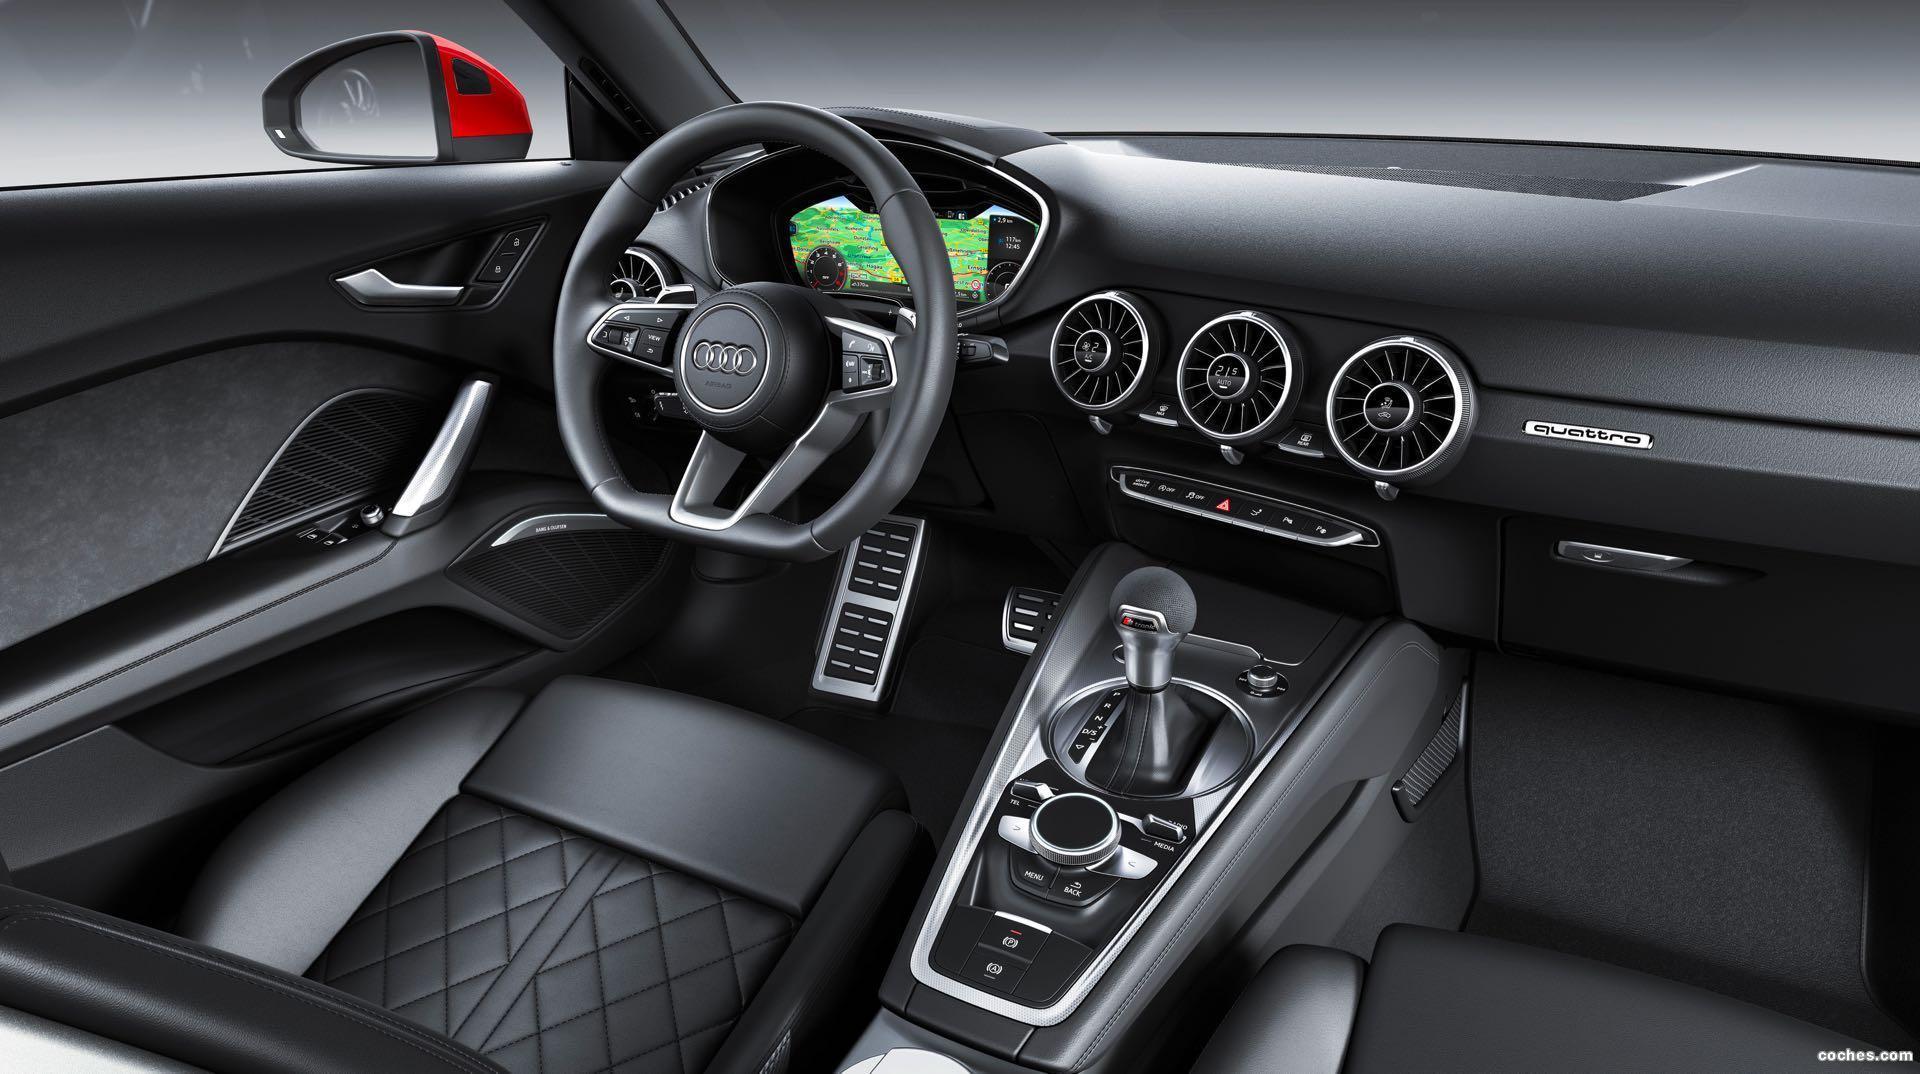 Foto 12 de Audi TT Coupe 45 TFSI quattro 2019